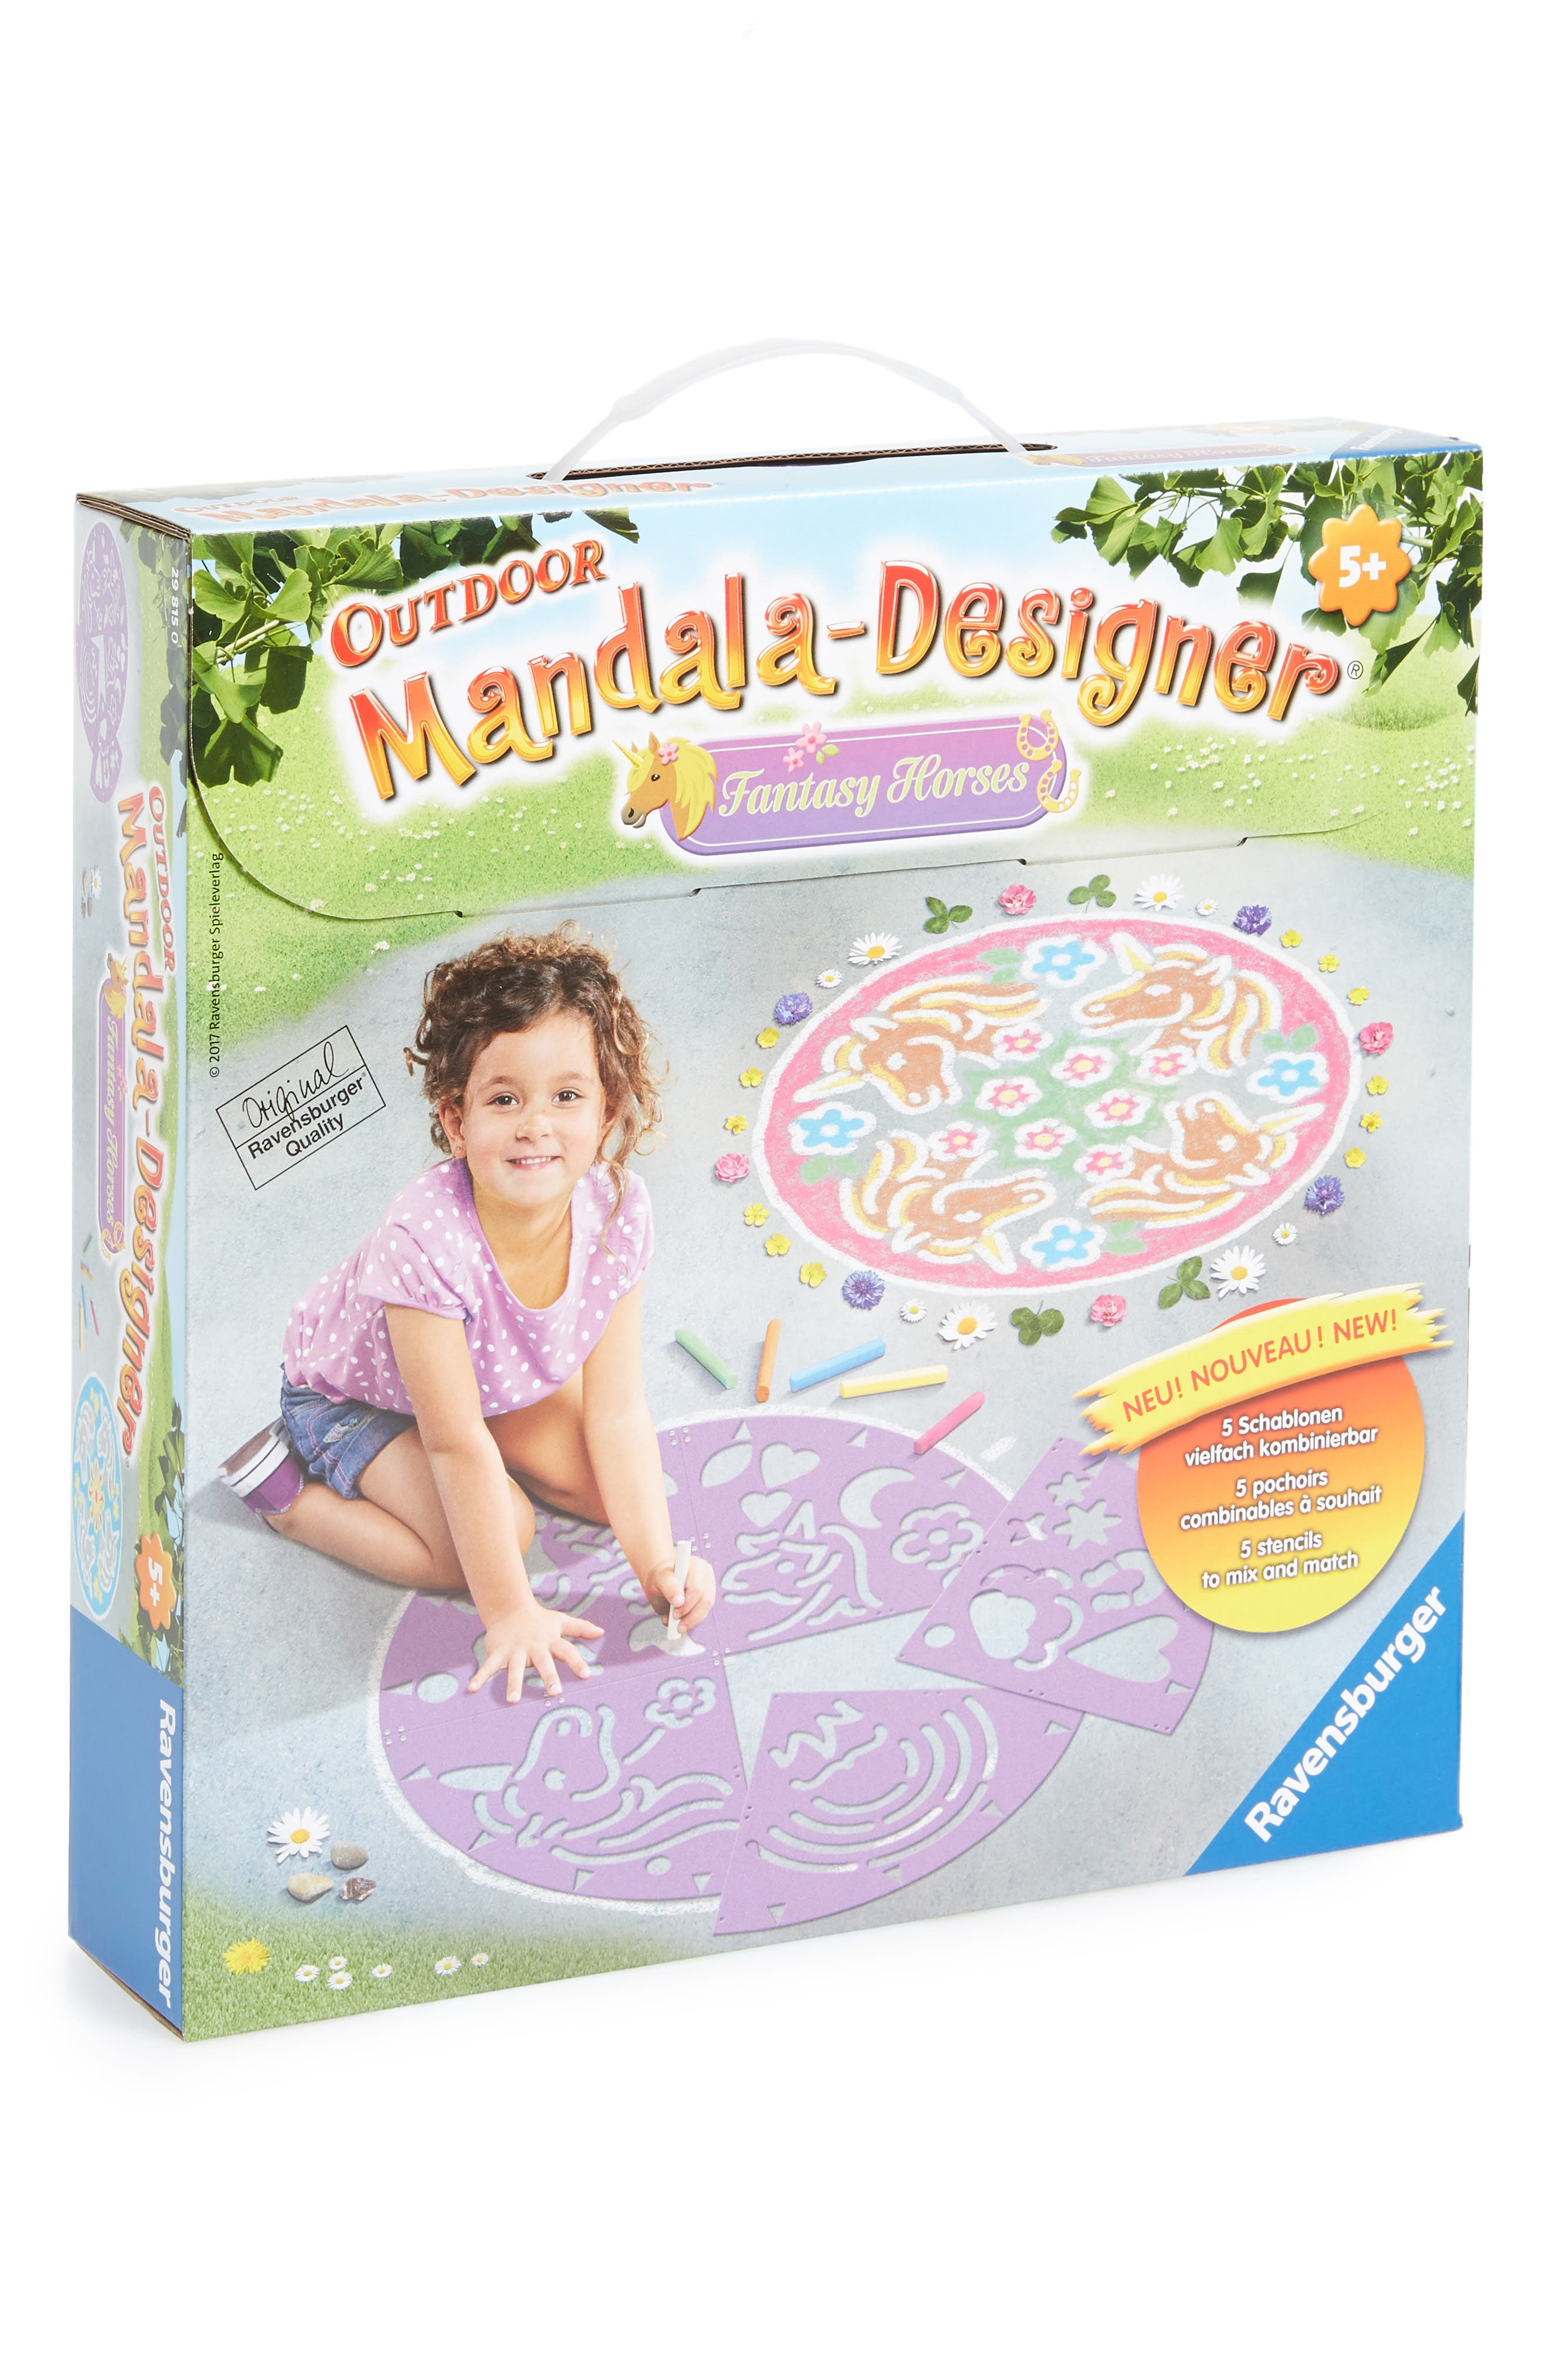 Outdoor Mandala Designer Fantasy Horses Chalk Kit,                             Main thumbnail 1, color,                             PURPLE